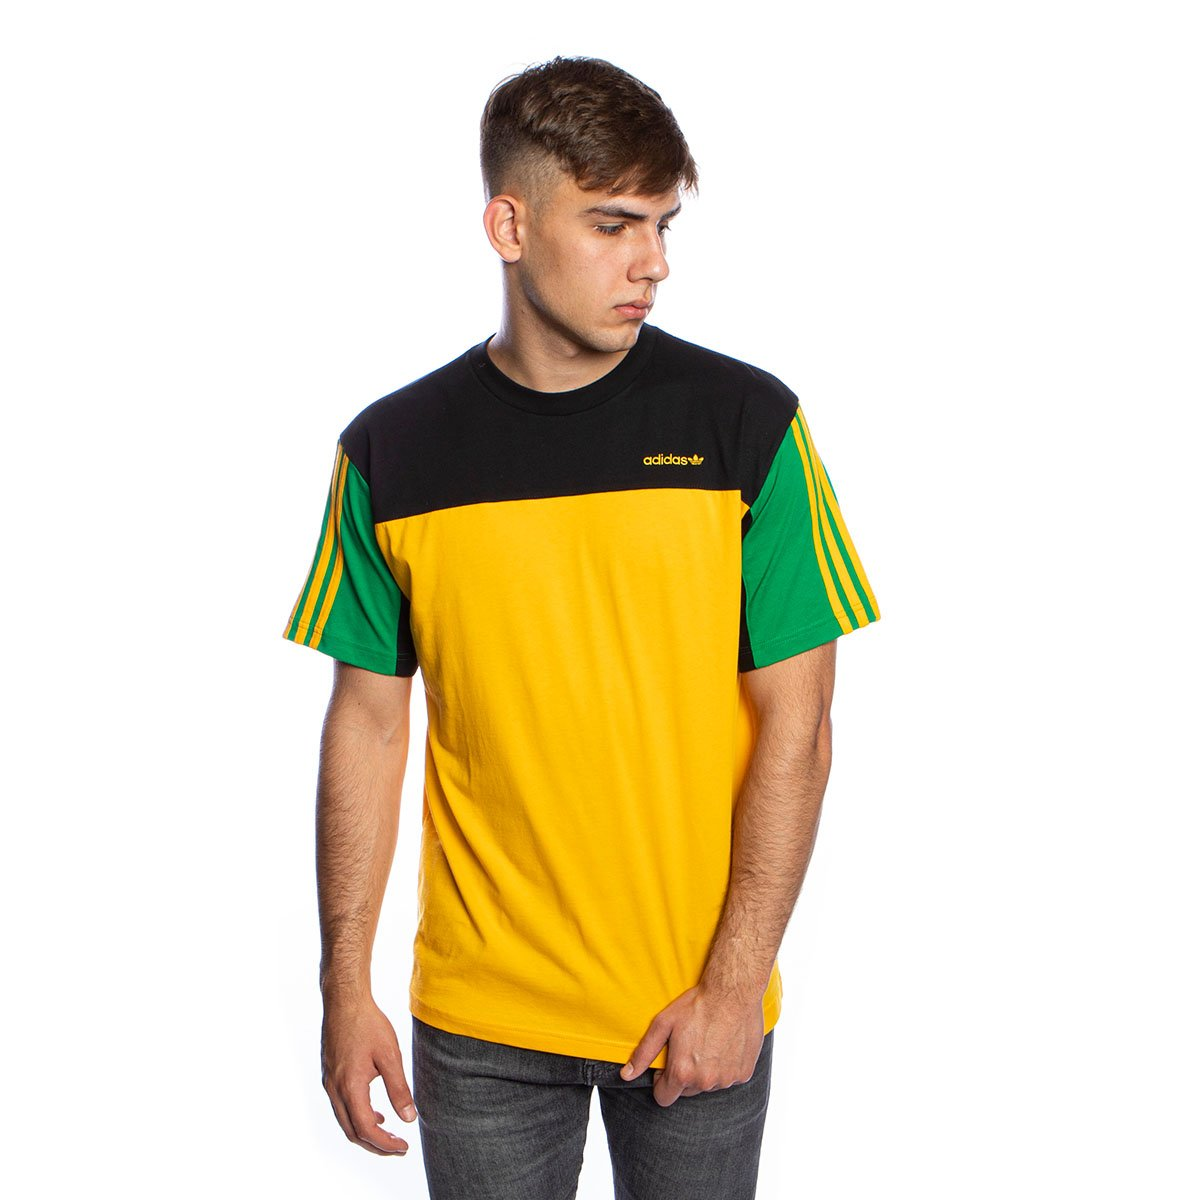 Uganda Vergonzoso secuencia  T-shirt Adidas Originals Classic SS tee active gold/black | Bludshop.com